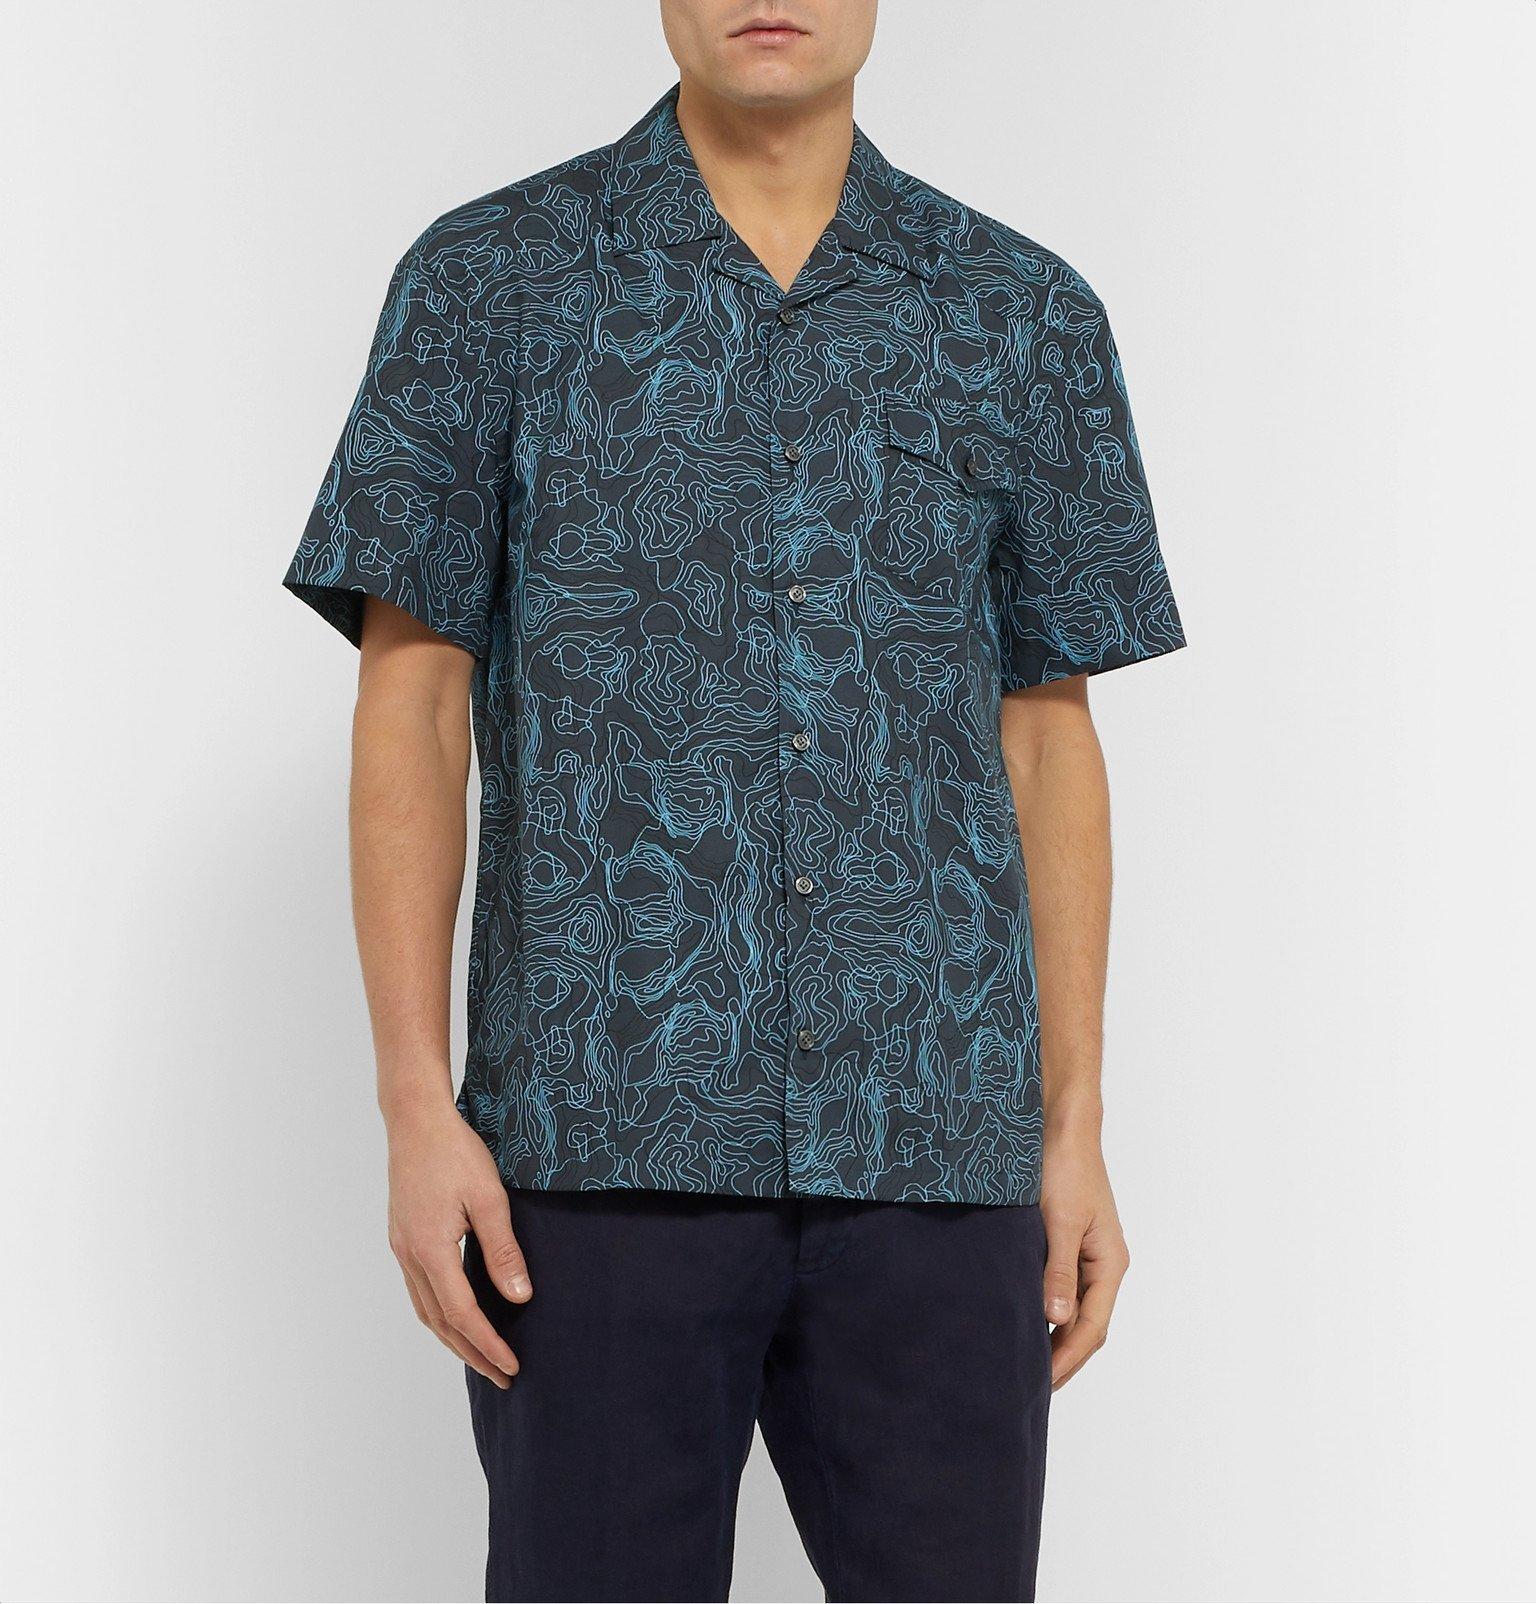 Tod's - Camp-Collar Printed Cotton Shirt - Blue